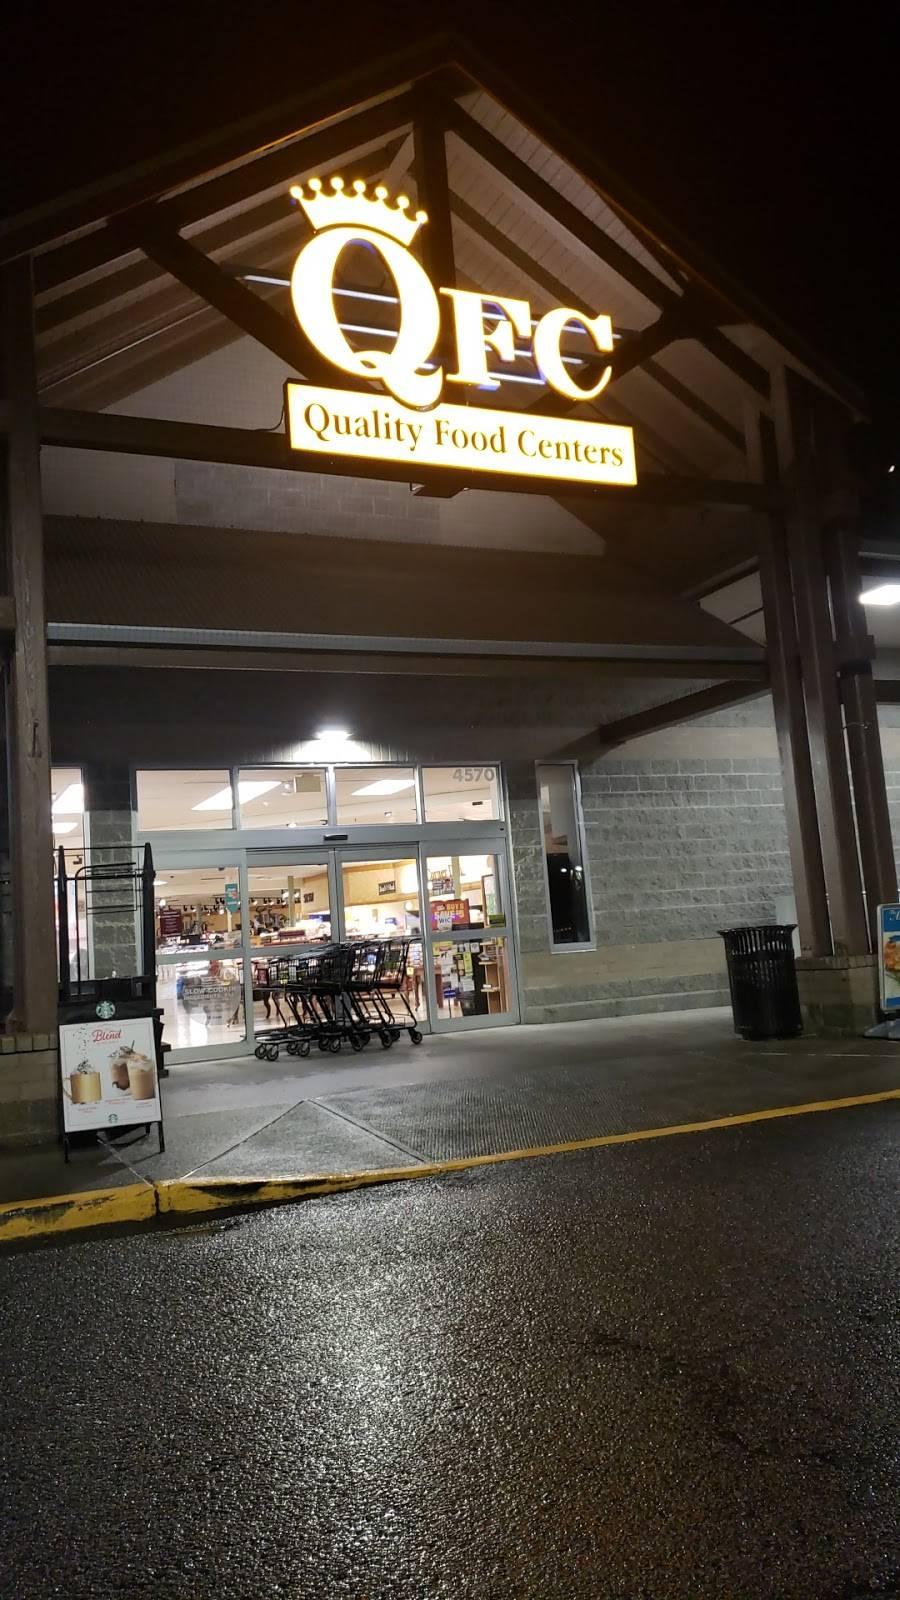 Klahanie Shopping Center | shopping mall | 4510-4592 Klahanie Dr SE, Sammamish, WA 98029, USA | 5036034700 OR +1 503-603-4700